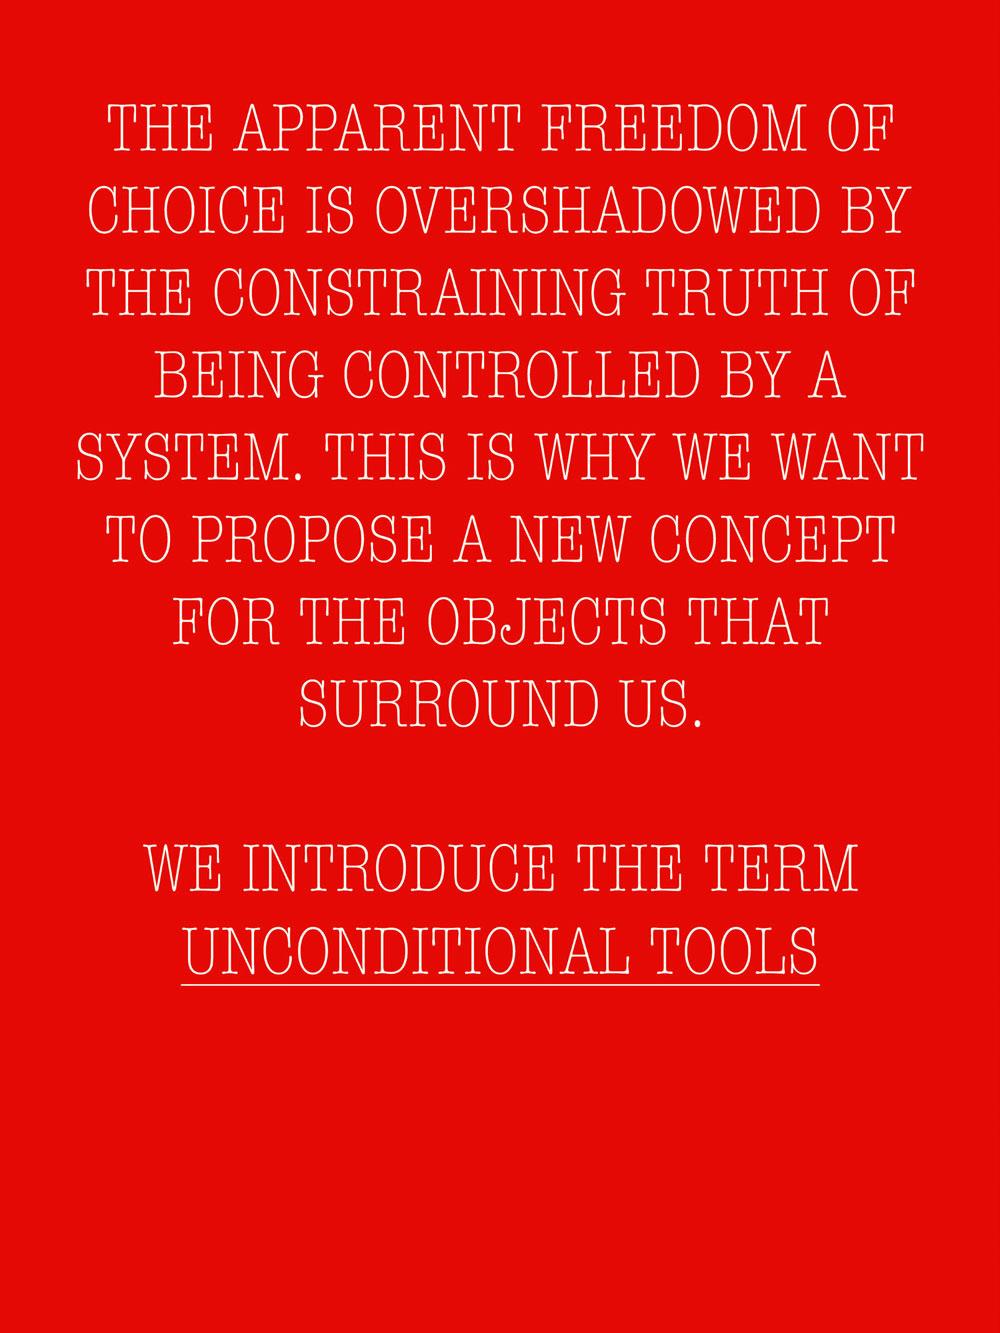 FUW_unconditional-tools